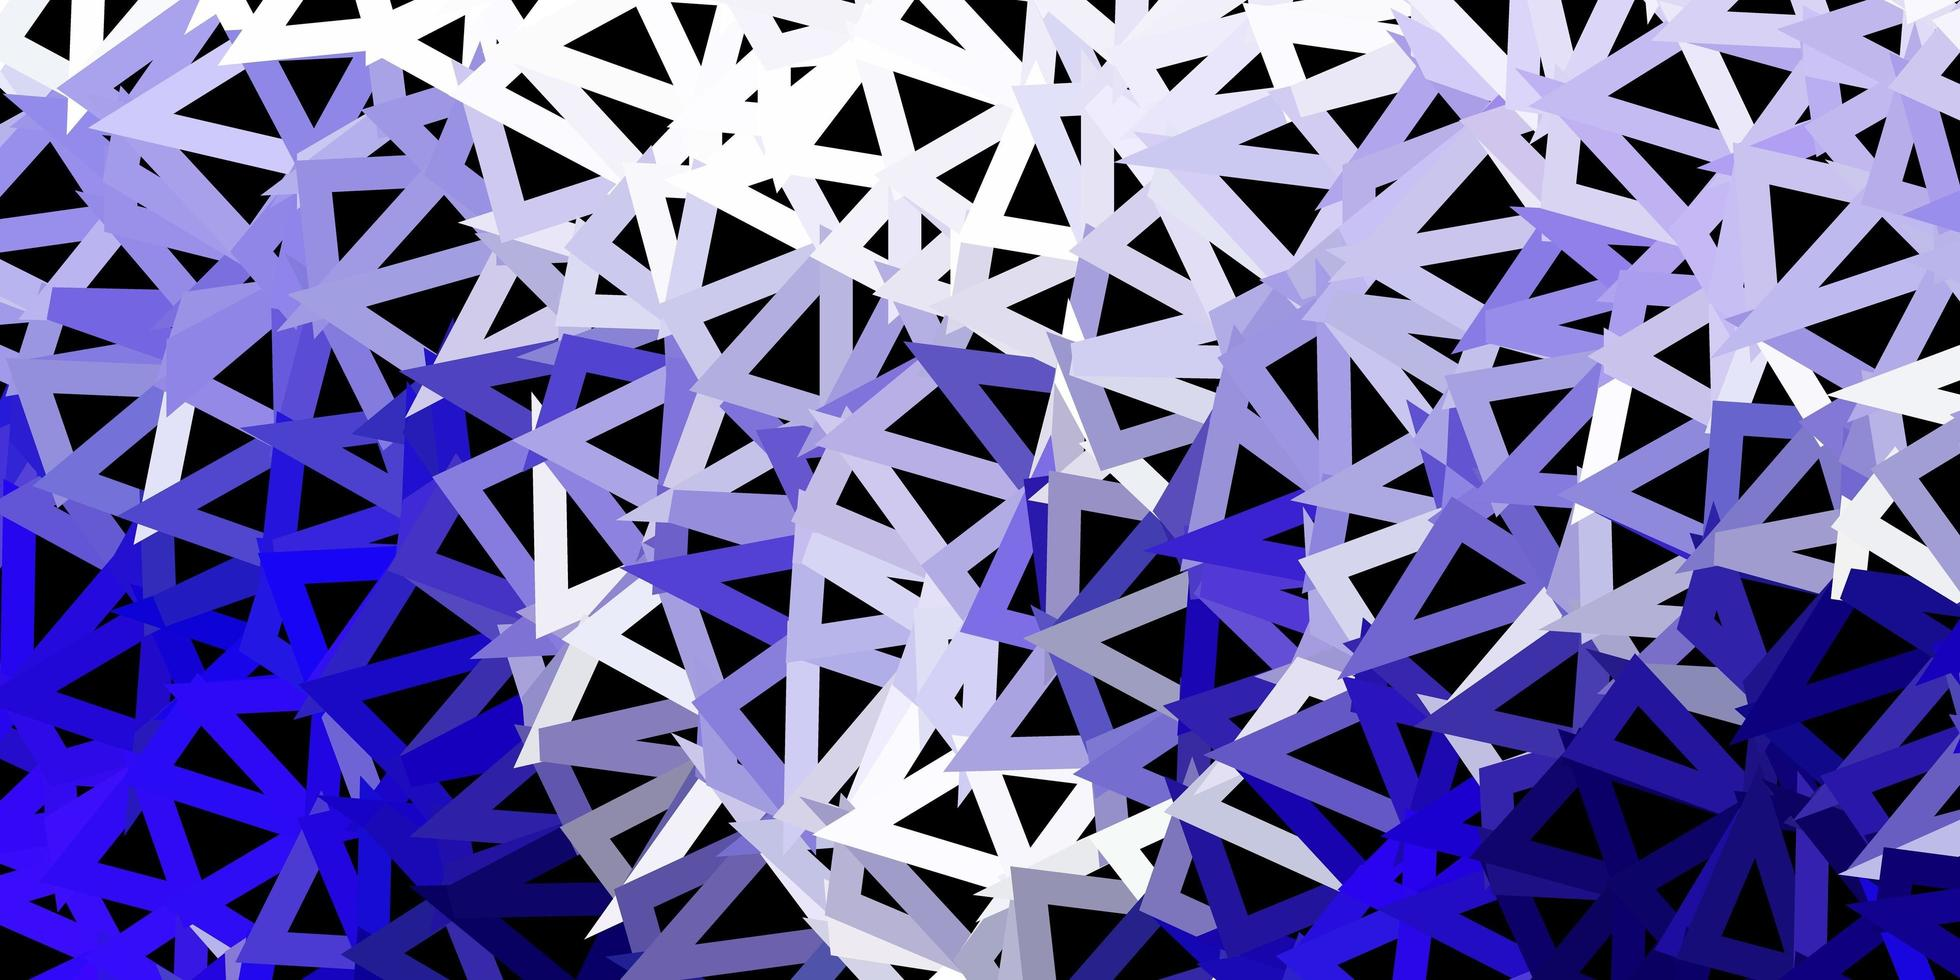 diseño de polígono degradado vectorial de color púrpura oscuro. vector